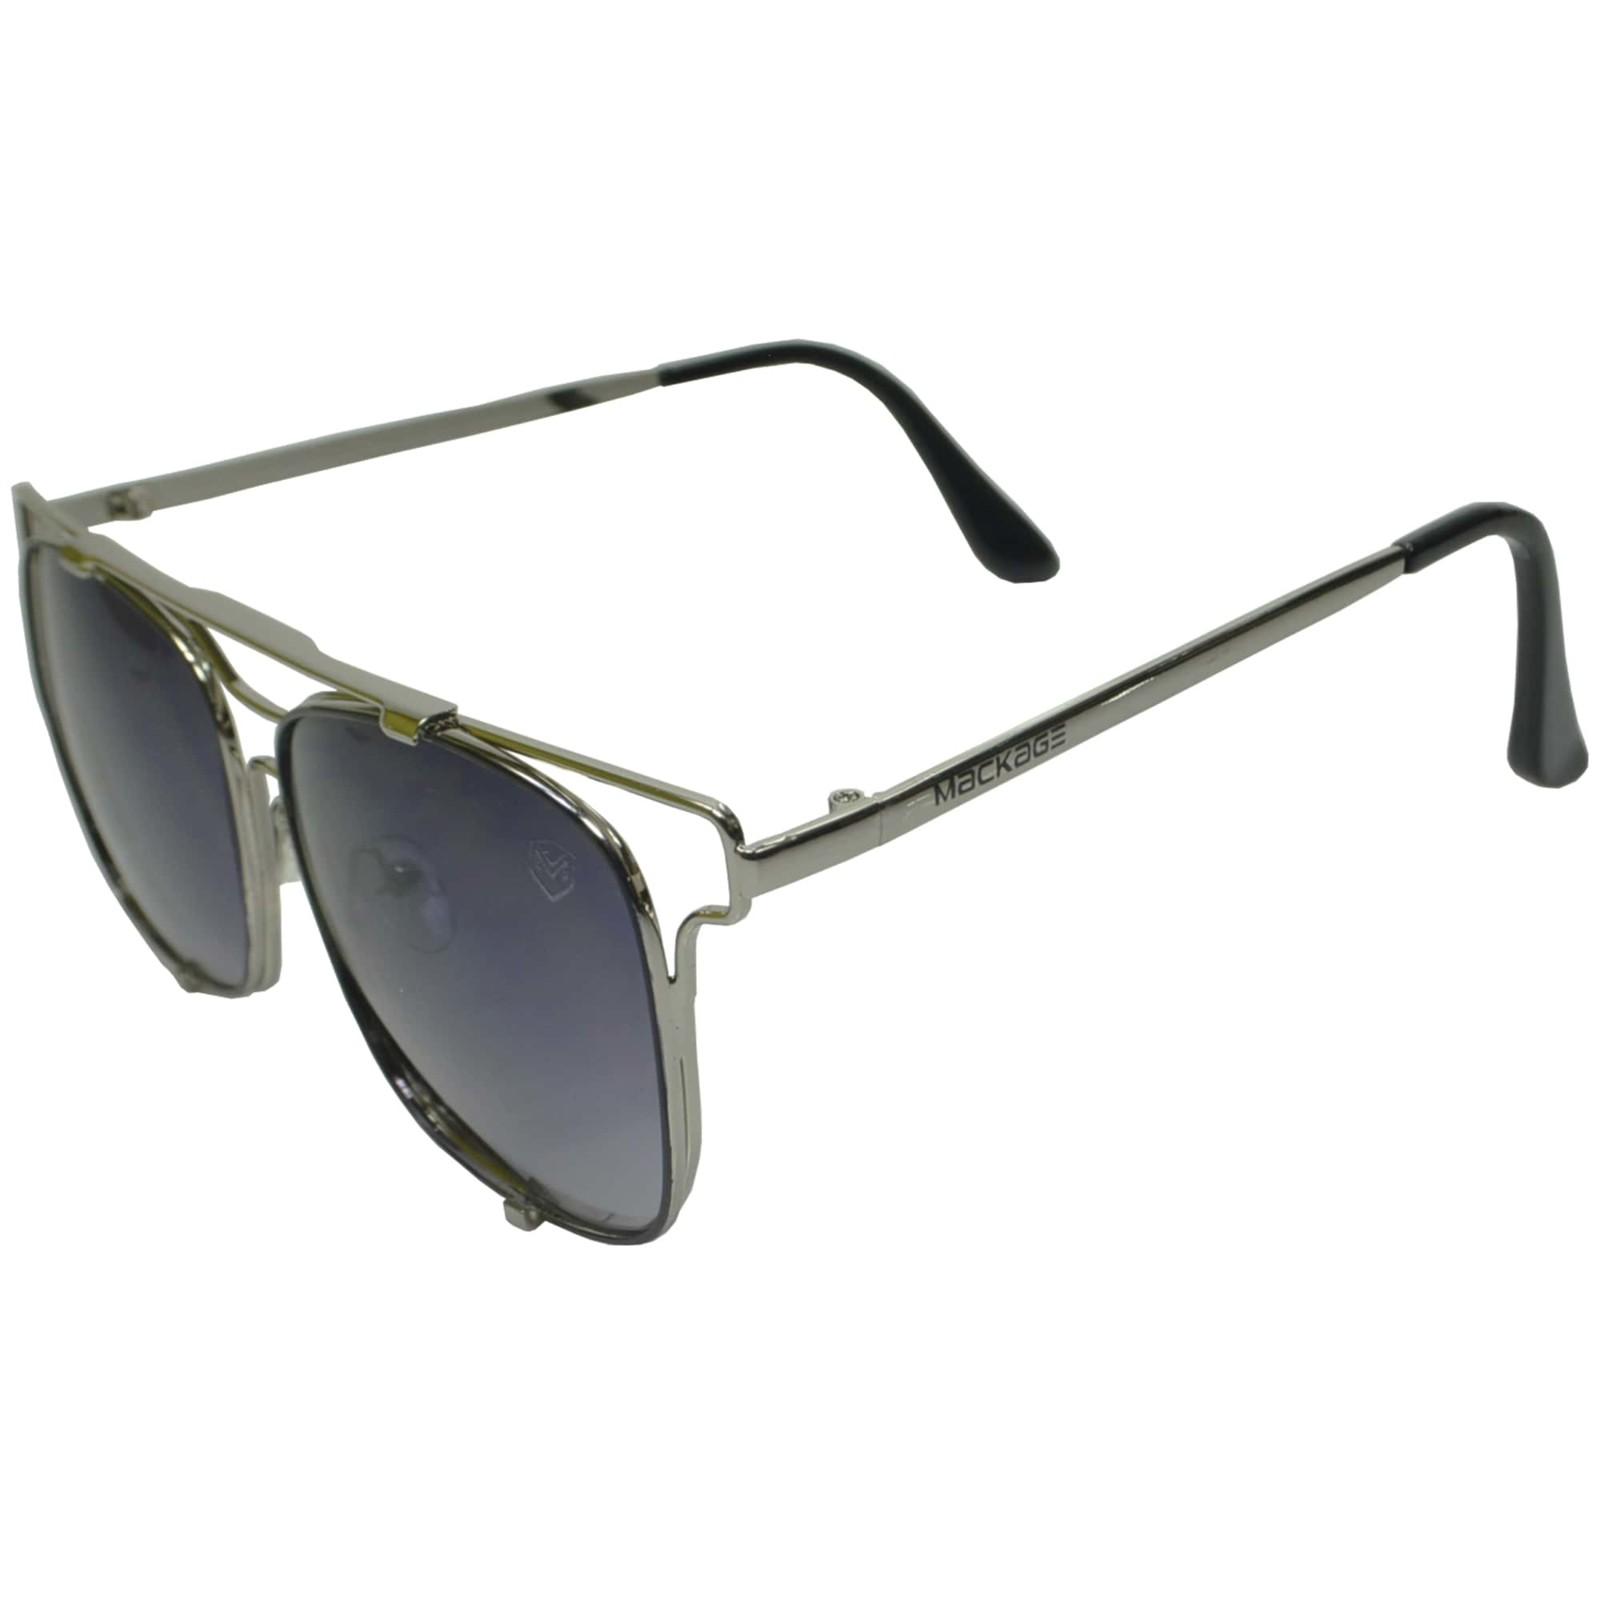 Óculos De Sol Mackage Unissex Metal Geometrico - Prata